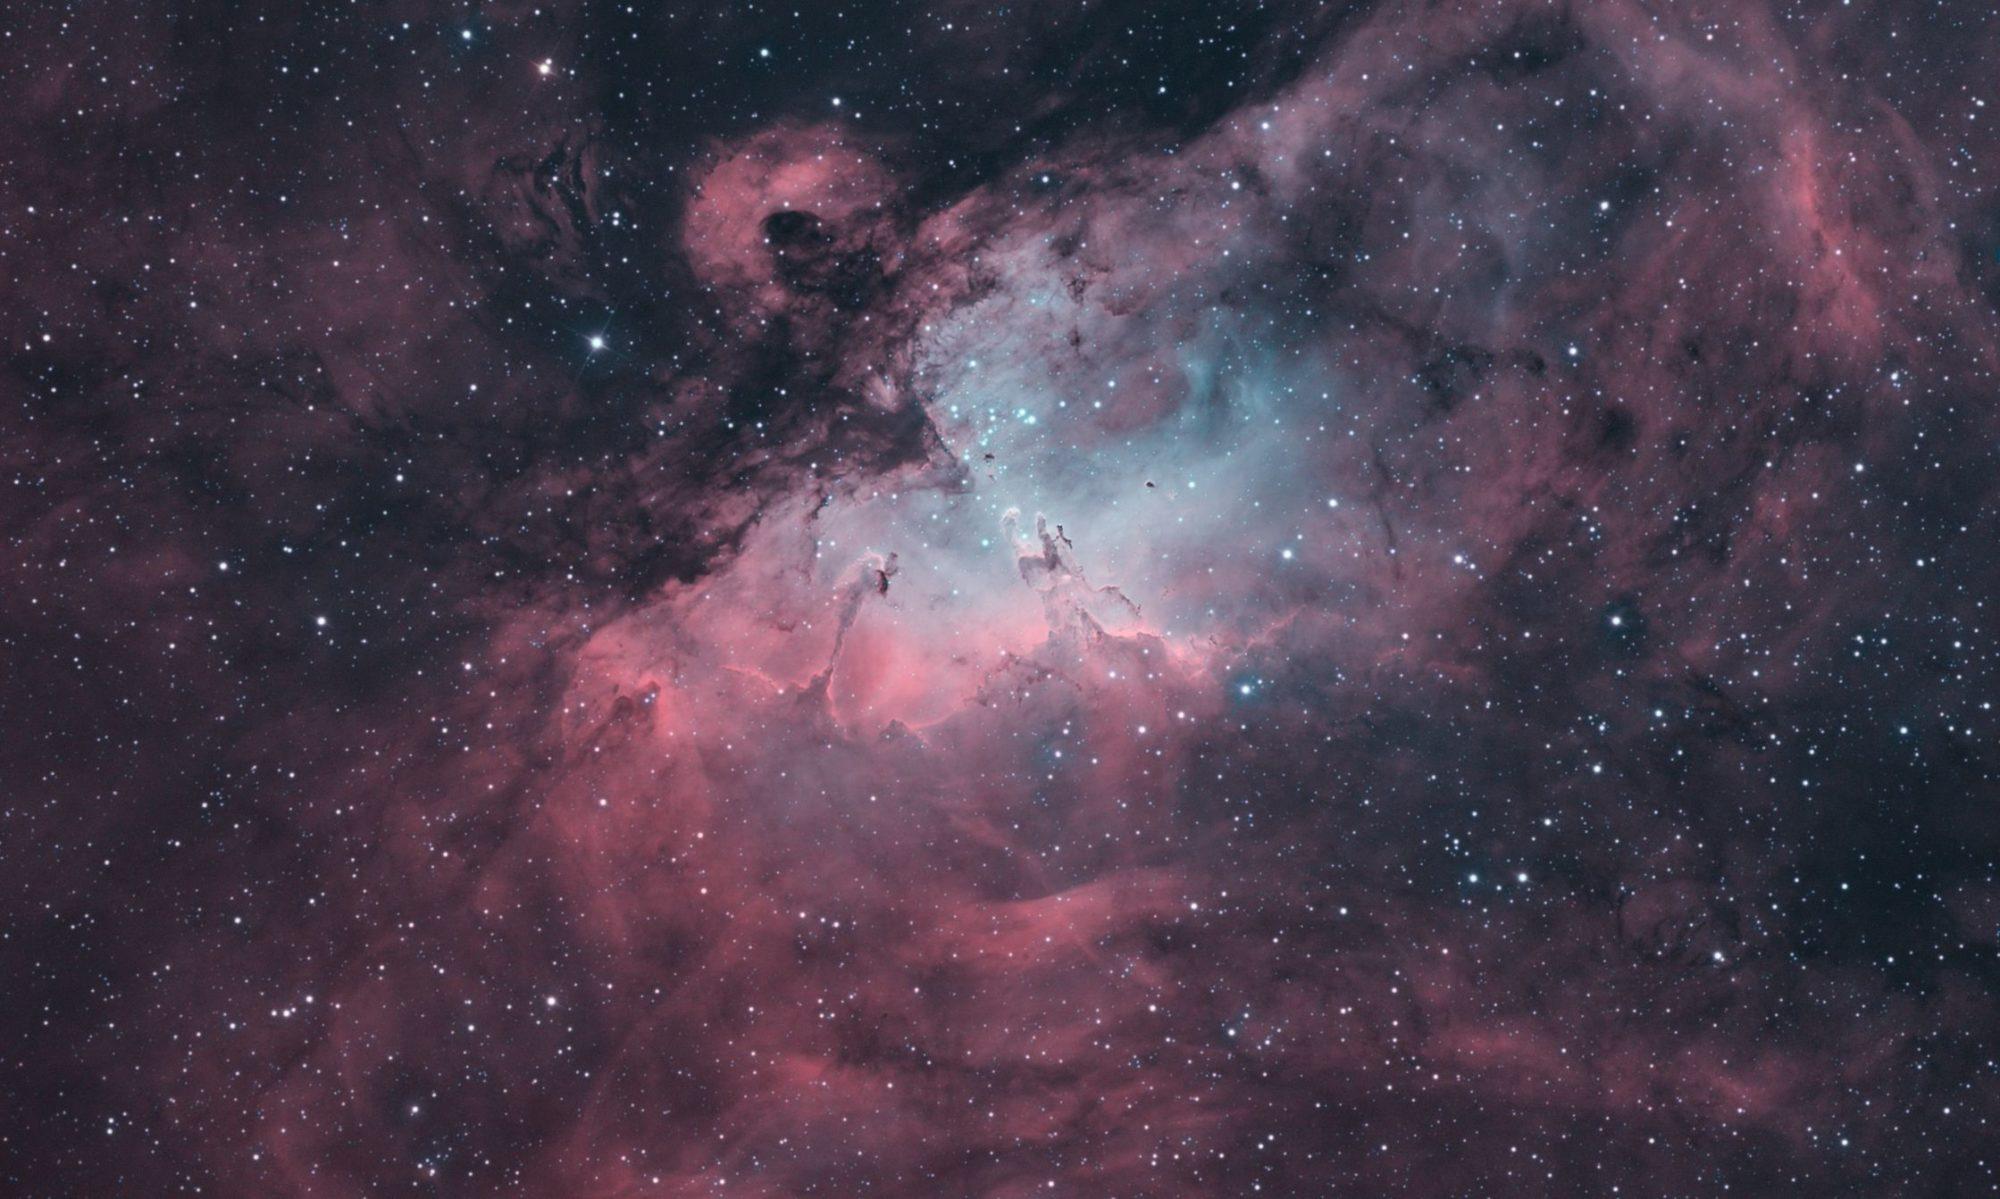 Nighttime Imaging 'N' Astronomy